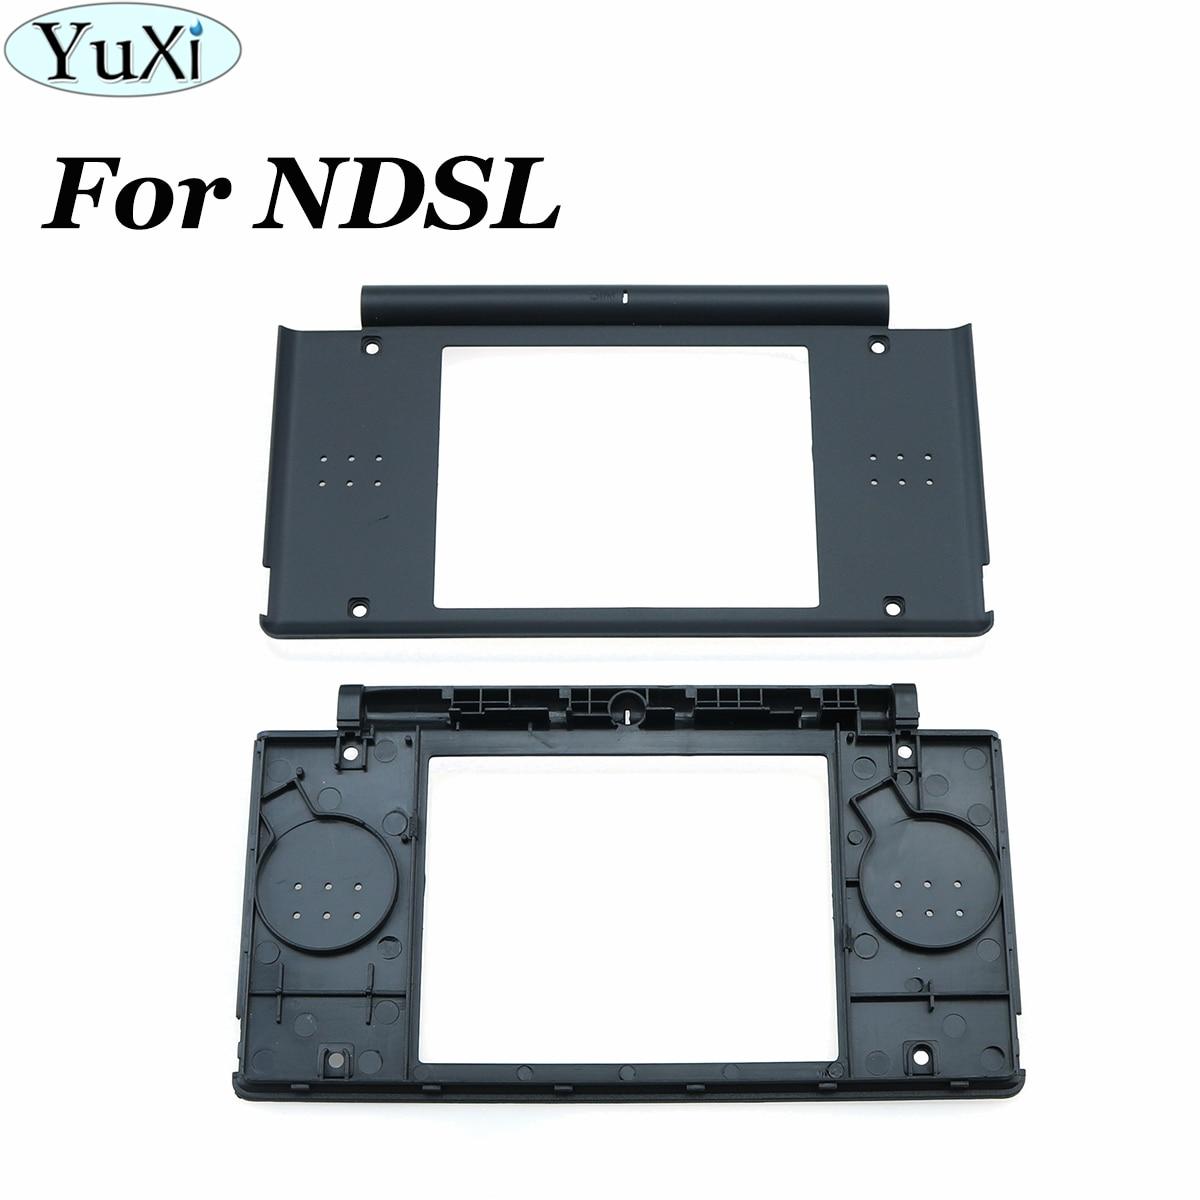 YuXi Upper Screen Inner Frame For DS Lite Frame Housing Shell Cover Case For NDSL Black Top Console